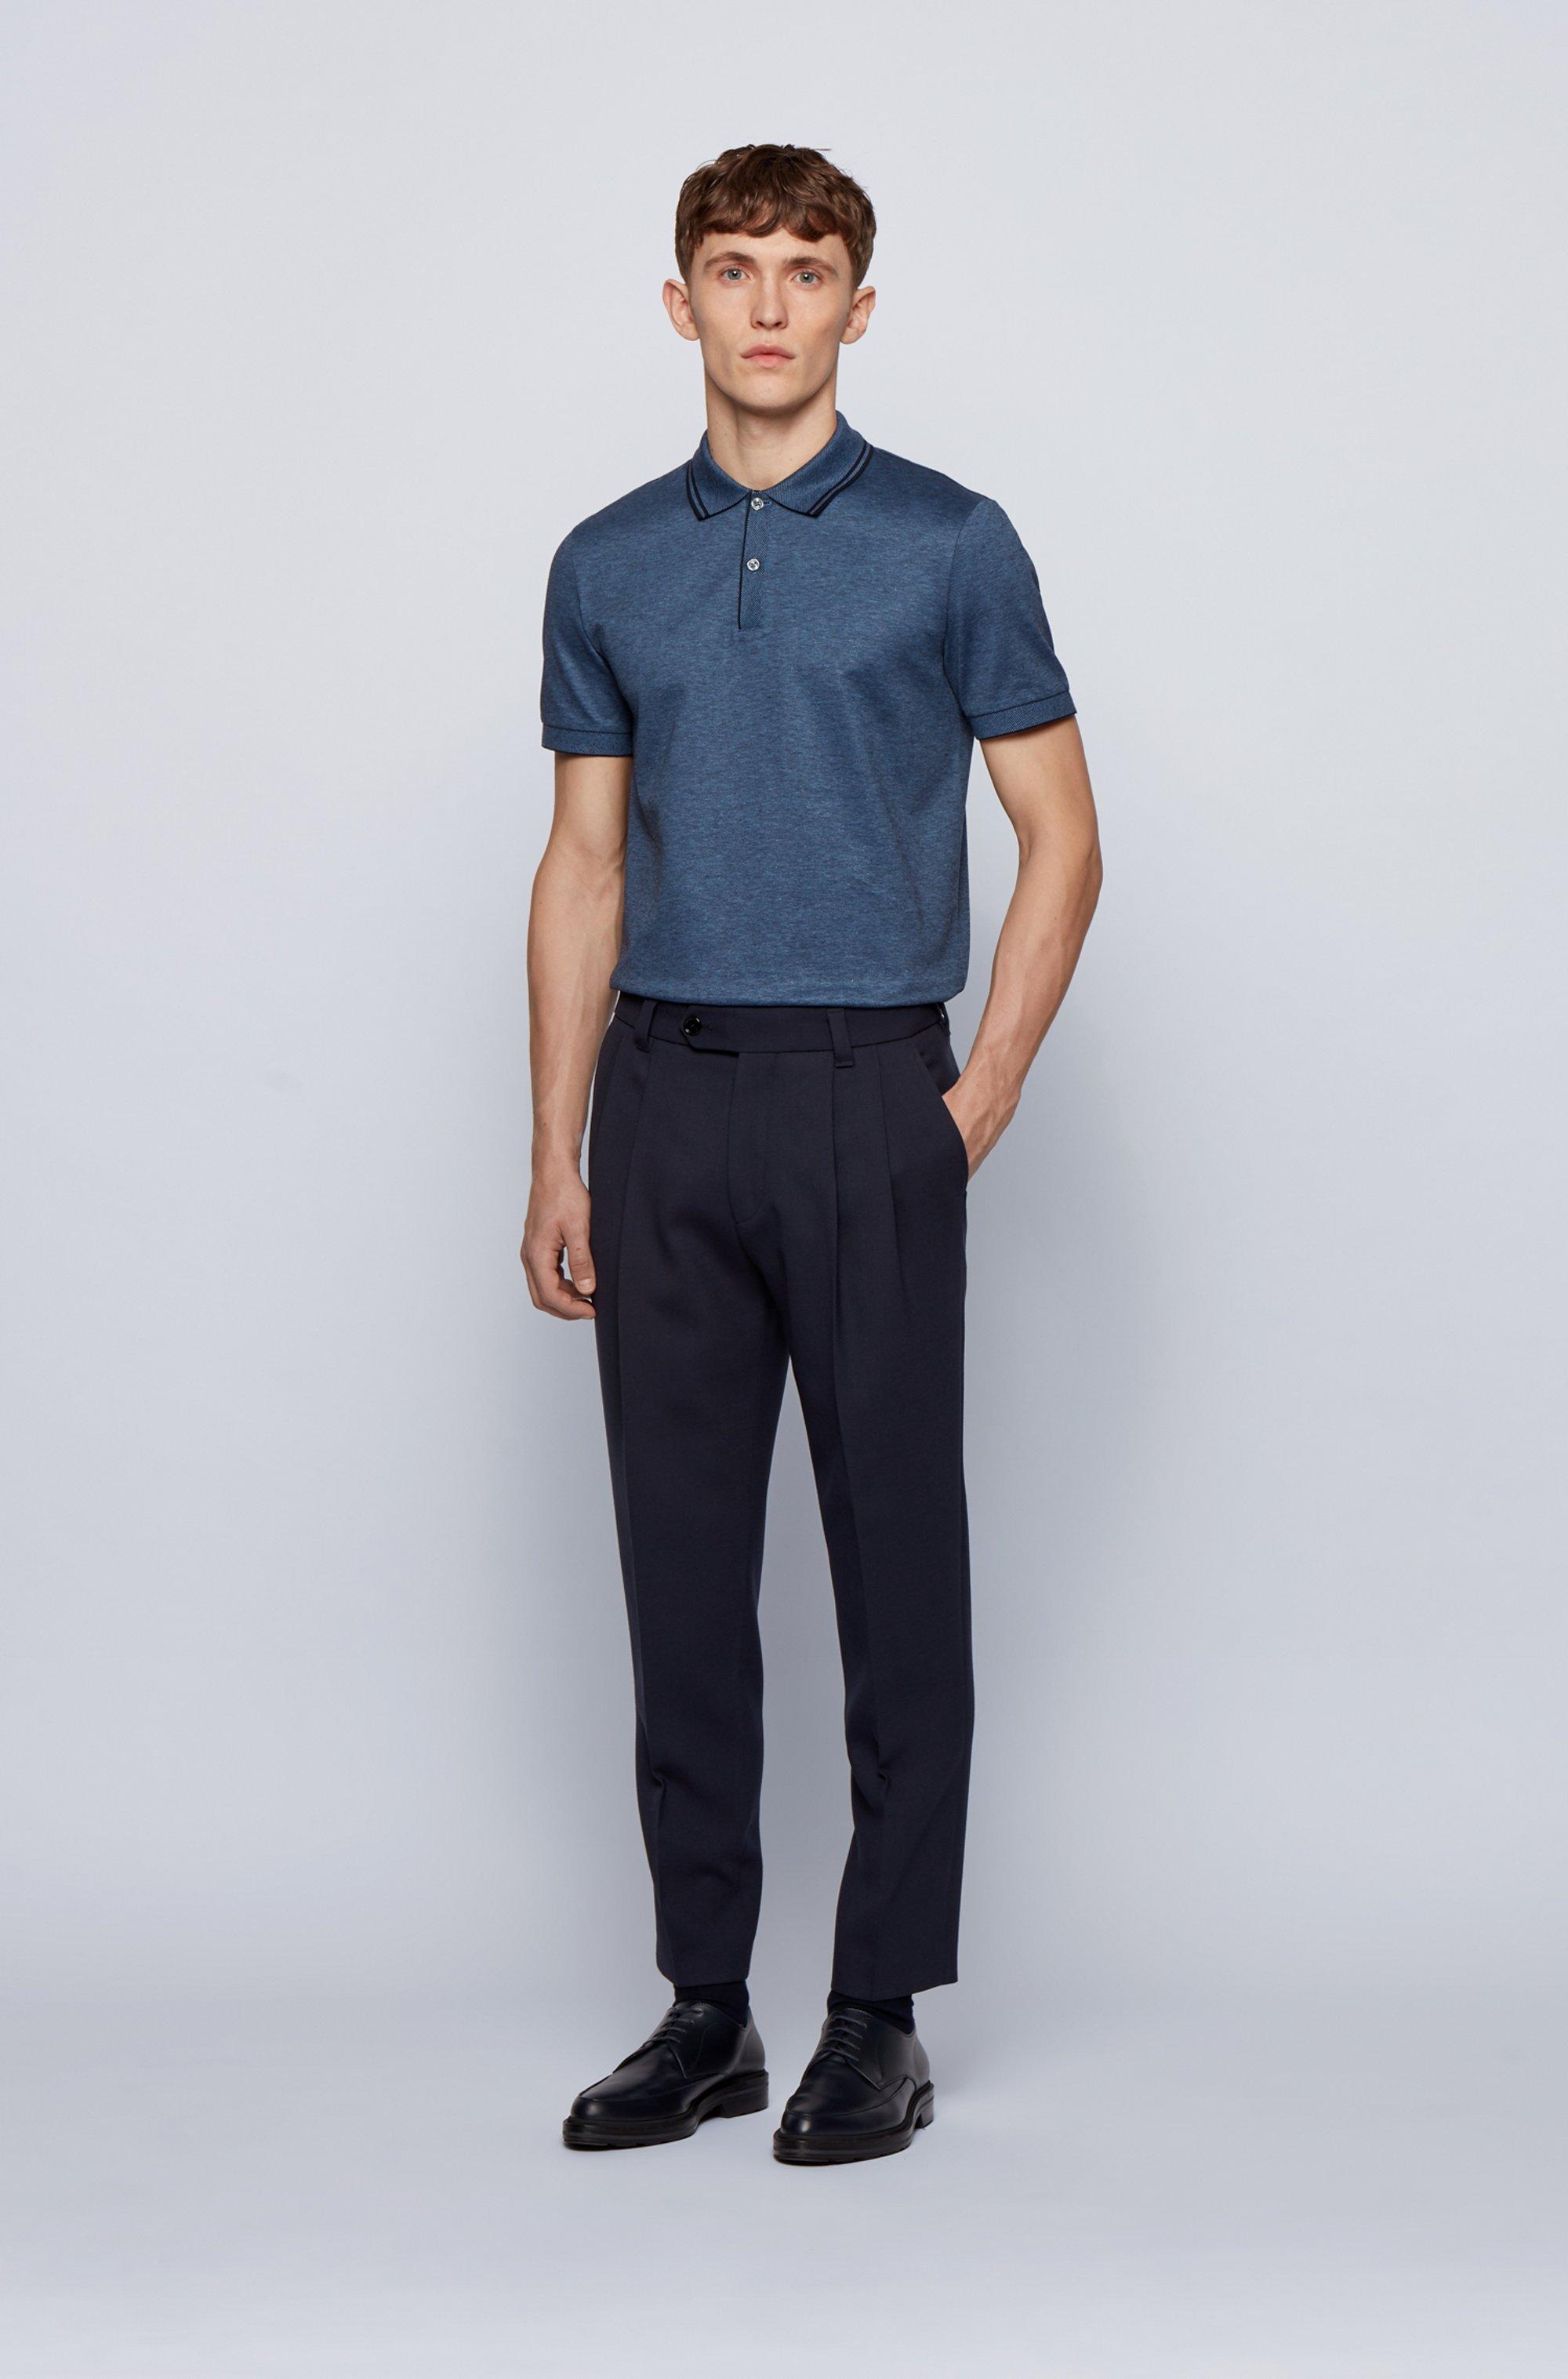 Regular-fit polo shirt in mercerised cotton and hemp